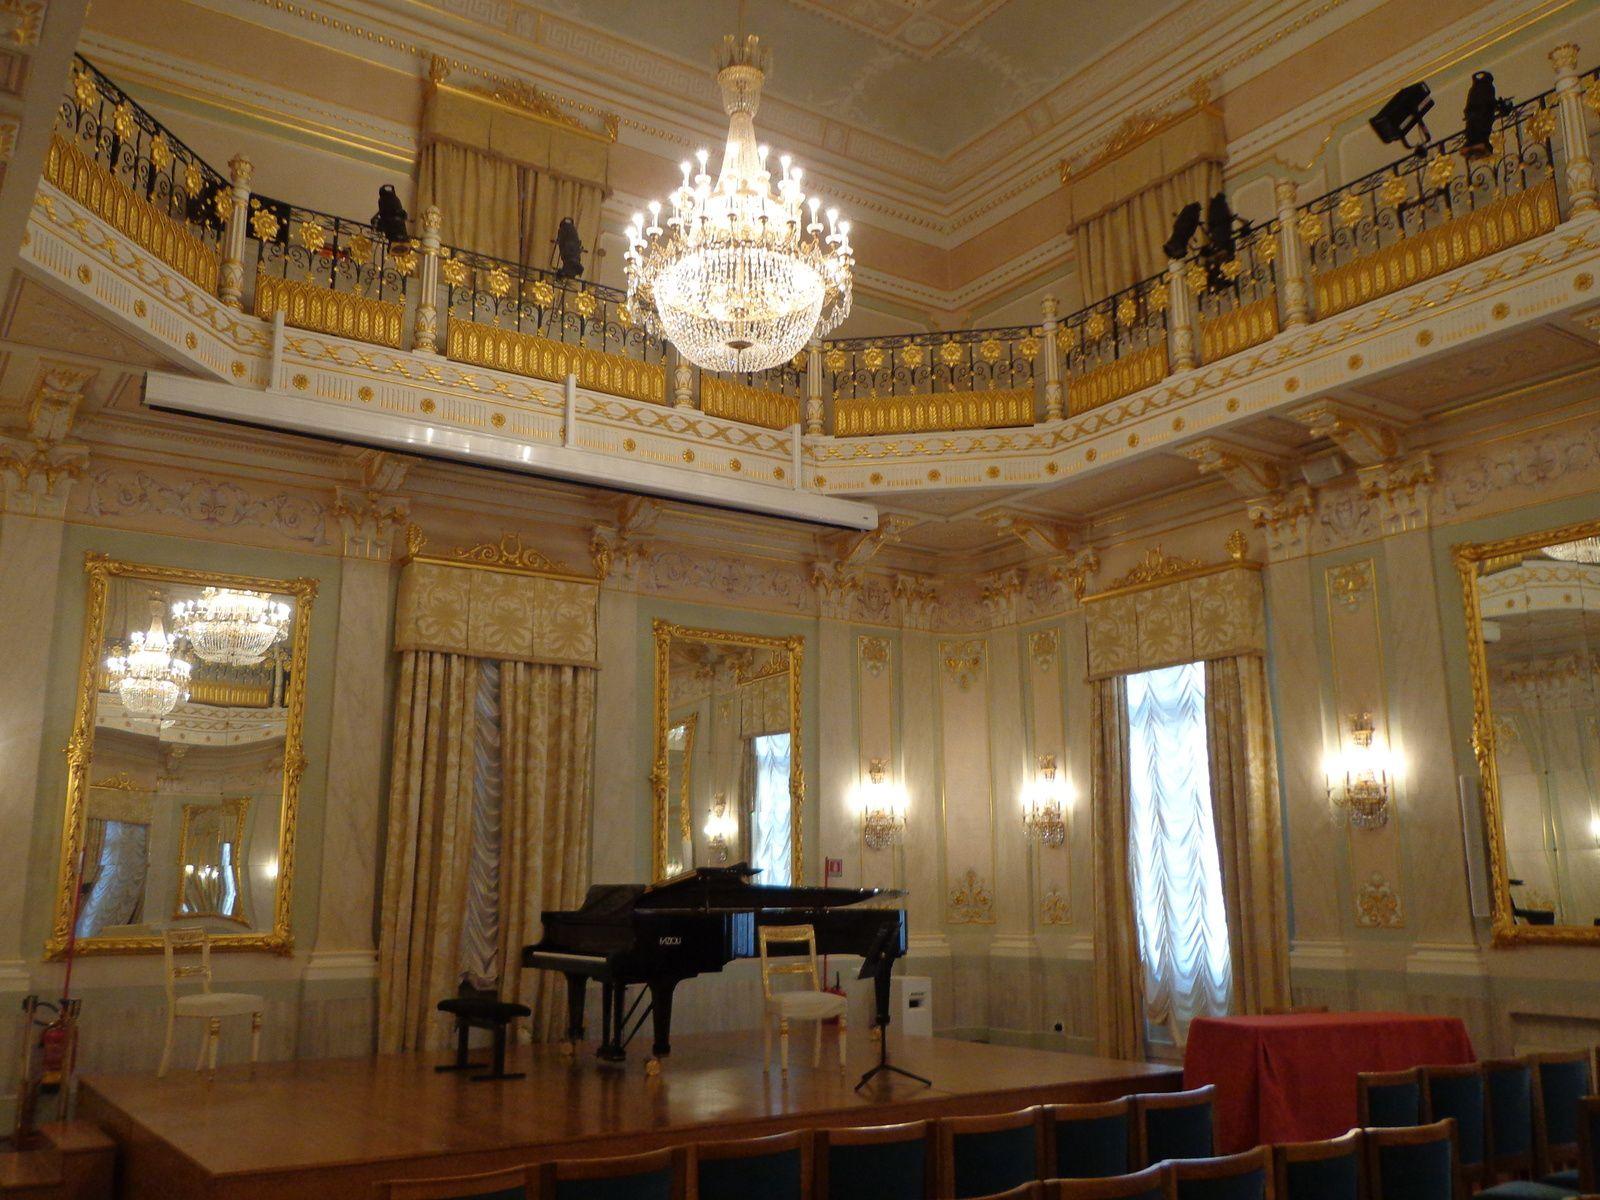 Venise : prélude à La Traviata